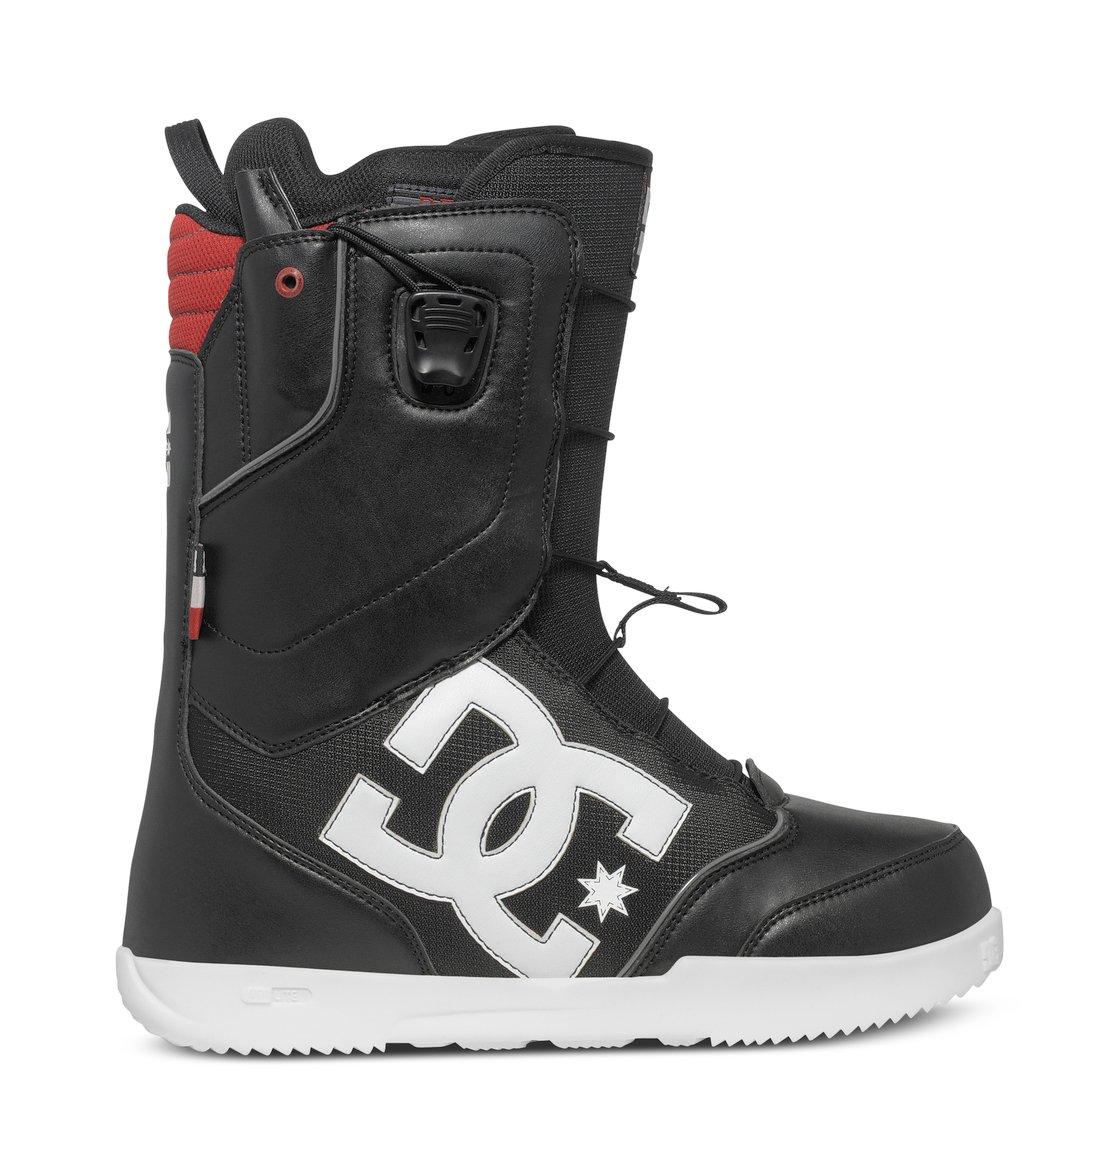 Avaris Boots